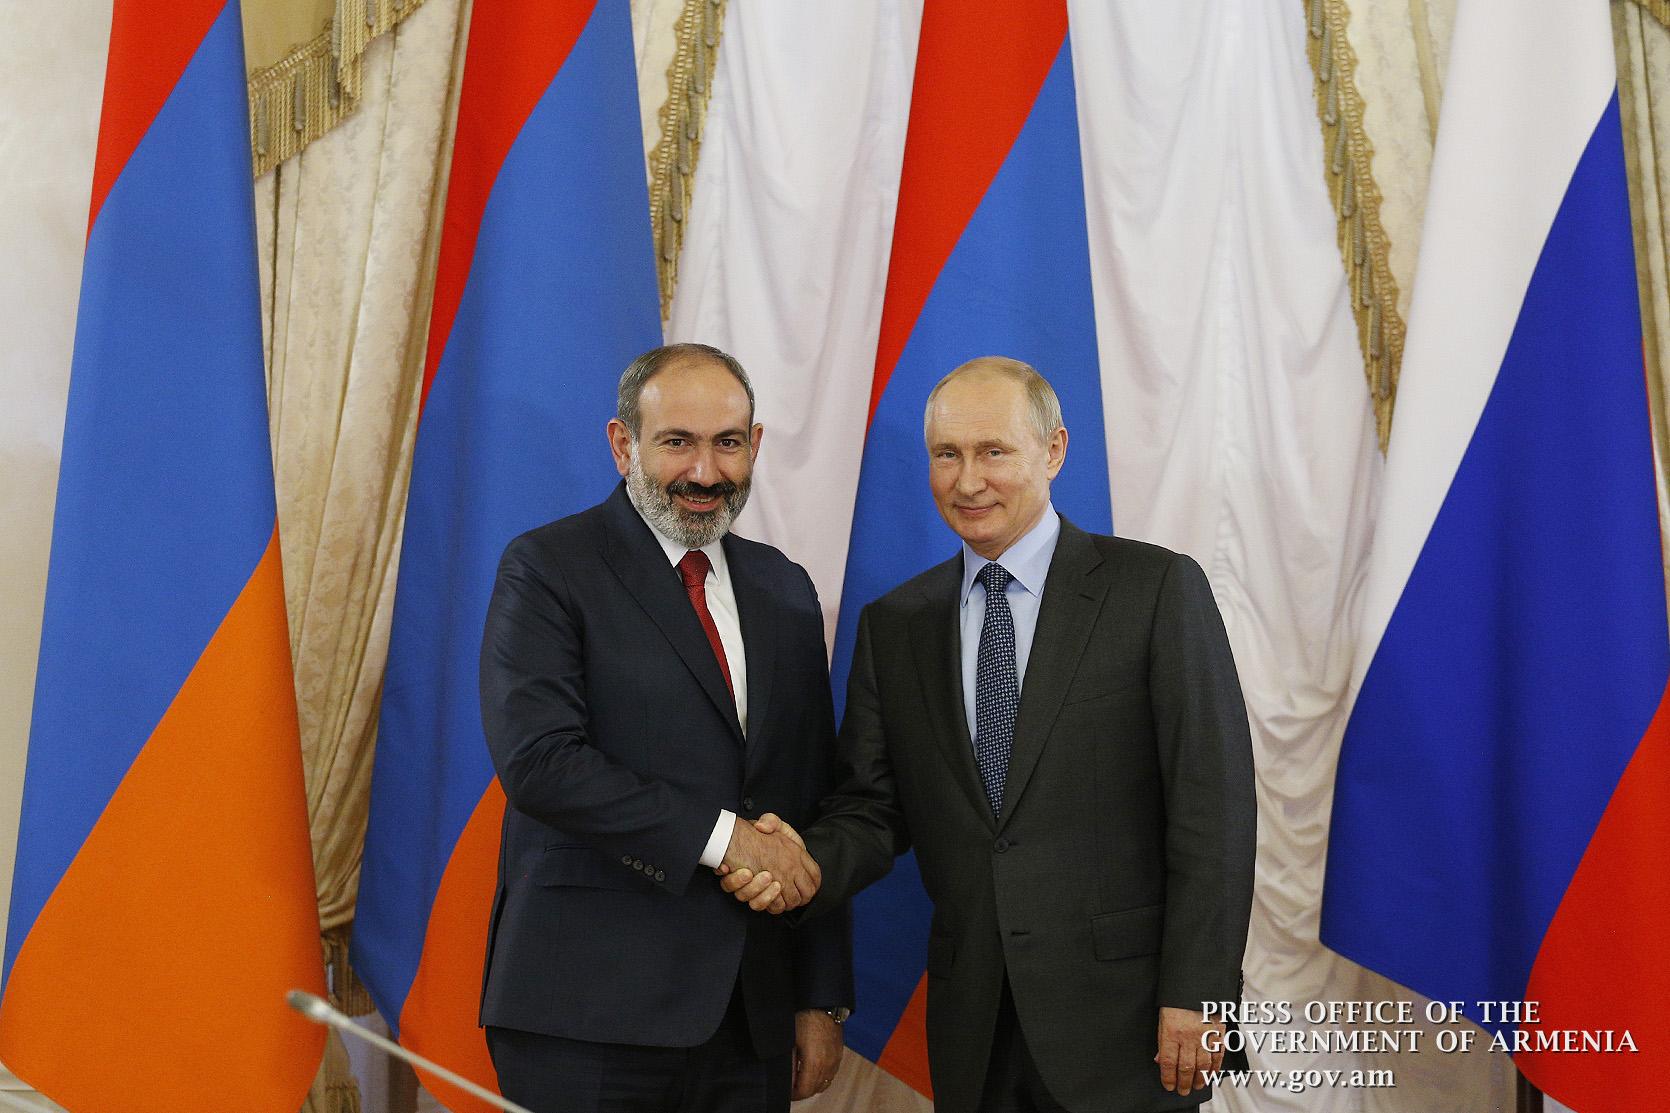 Armenian-Iranian friendly